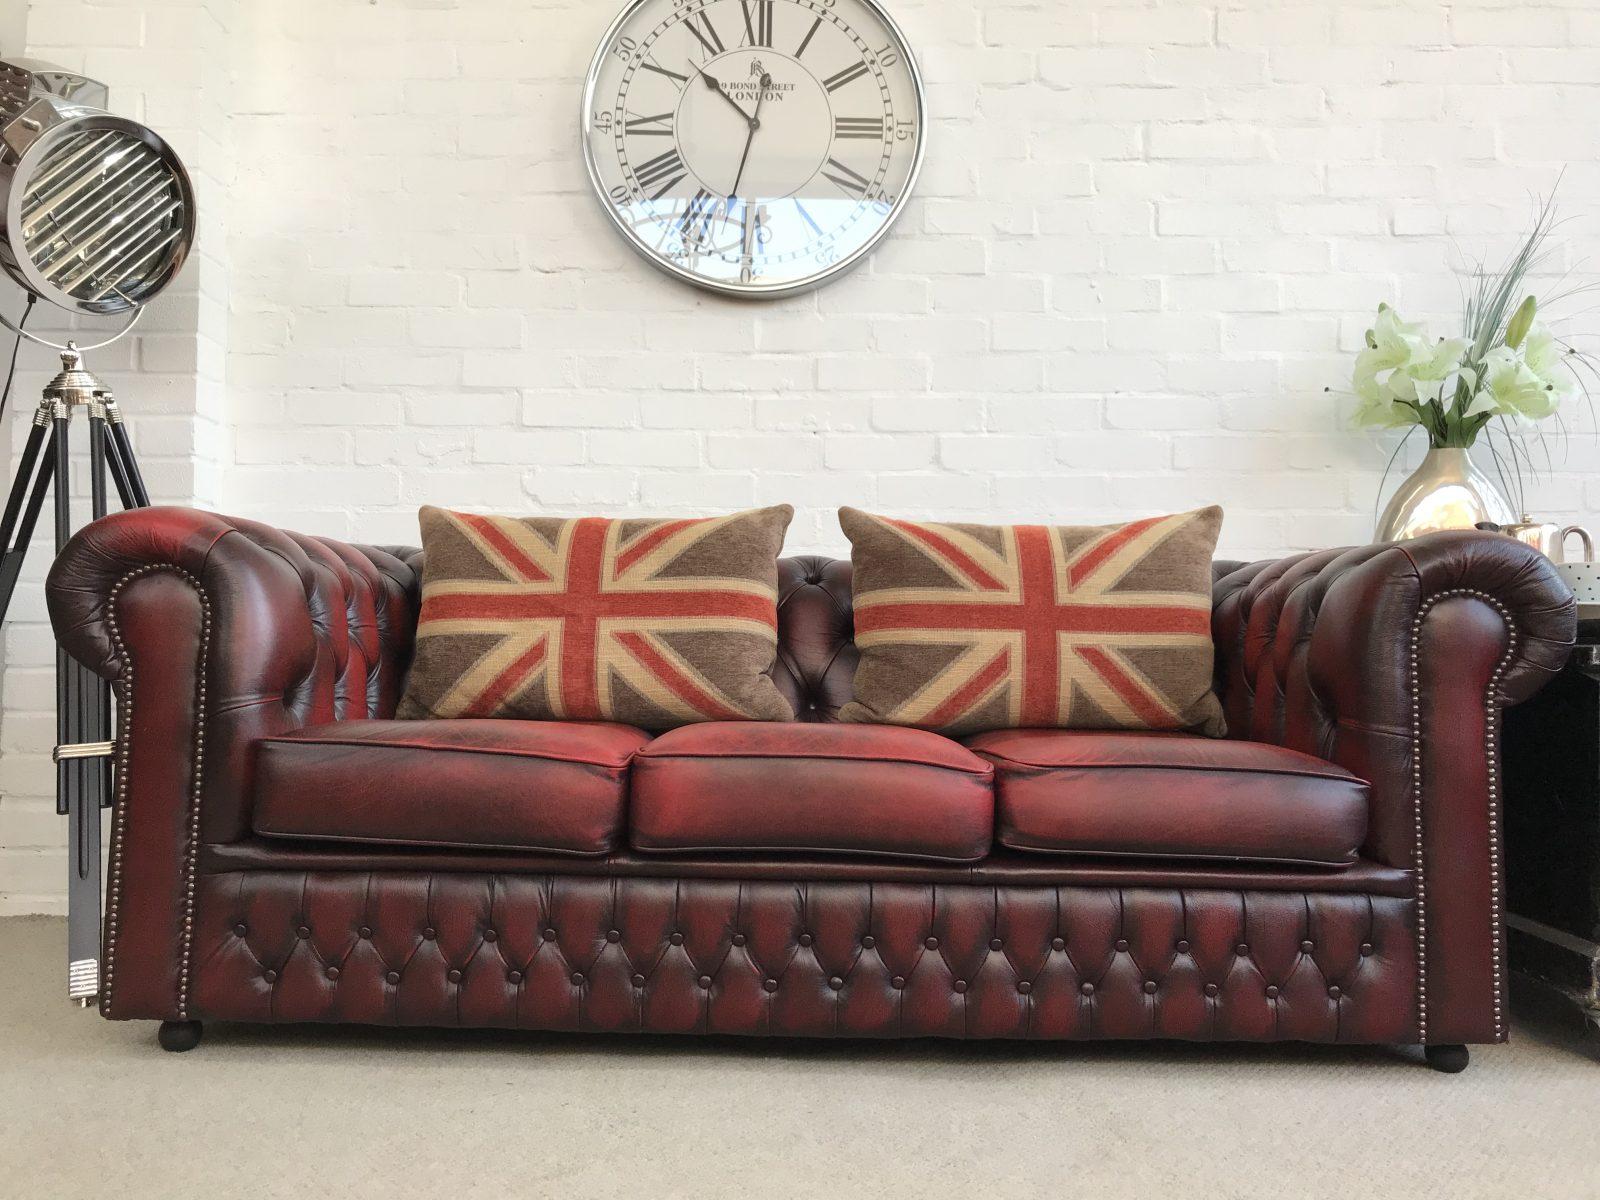 Oxblood Saxon Chesterfield Sofa.